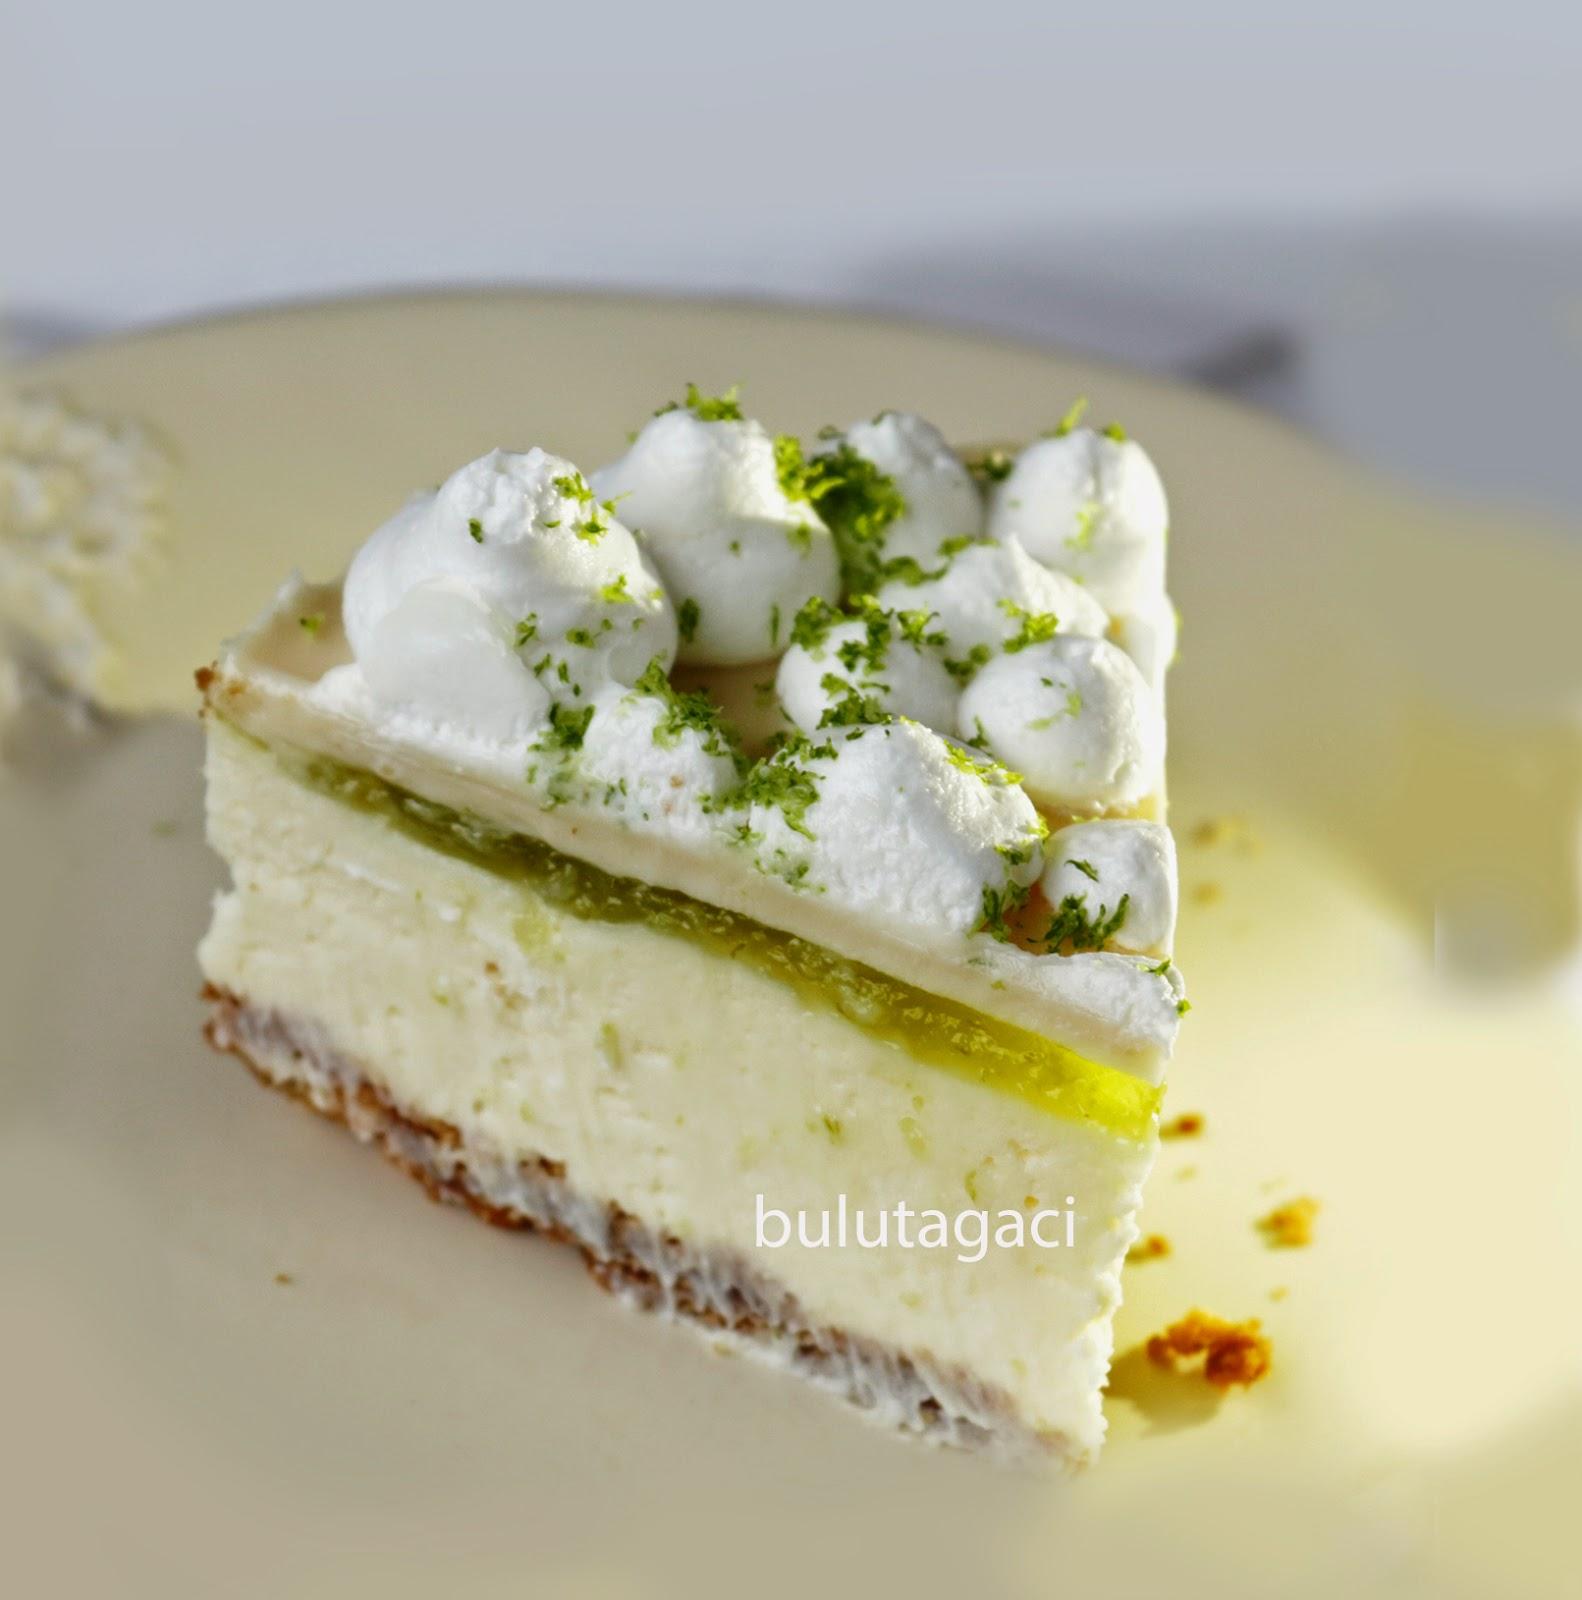 Beyaz Çikolata ve Misket Limonlu Cheesecake / No bake White Chocolate and Lime Cheesecake